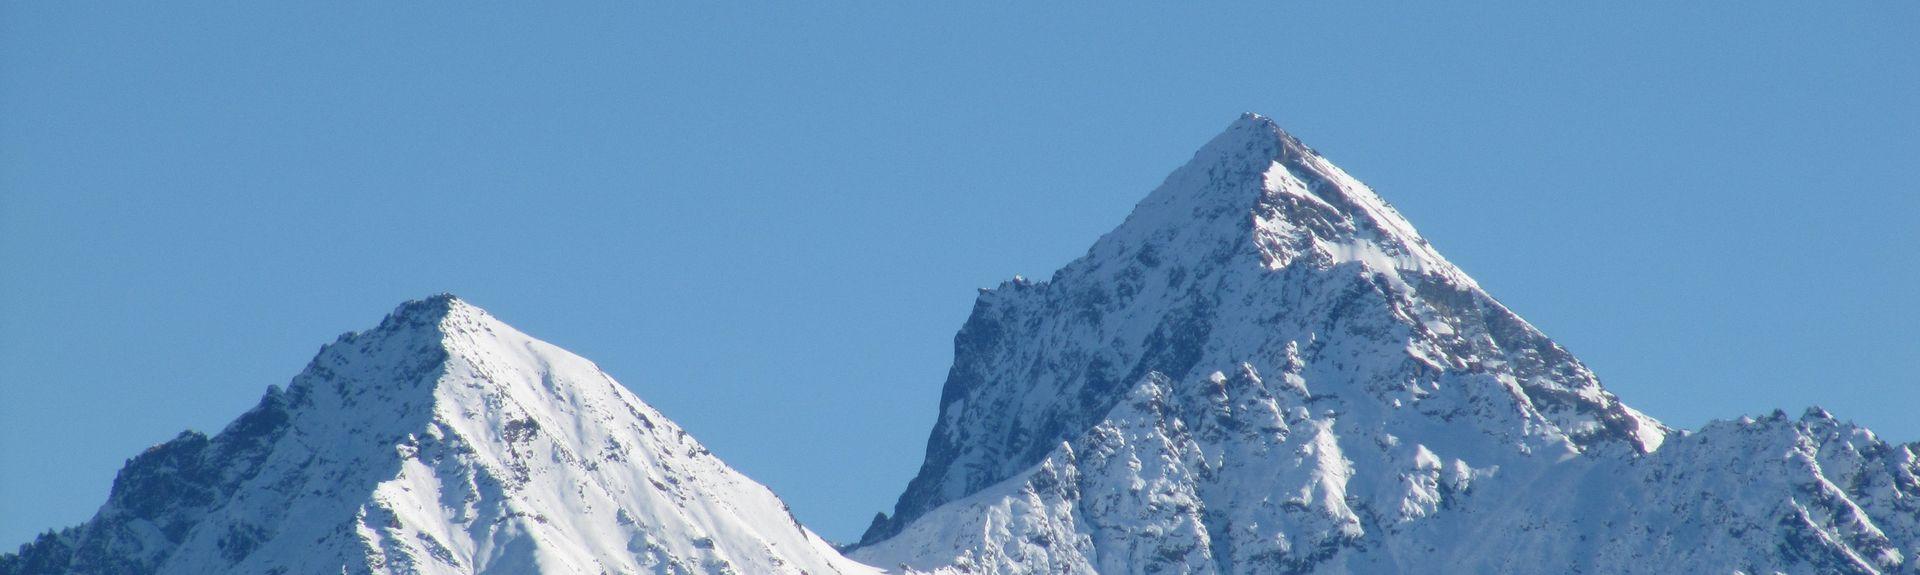 Ozein, Aymavilles, Val d'Aoste, Italie